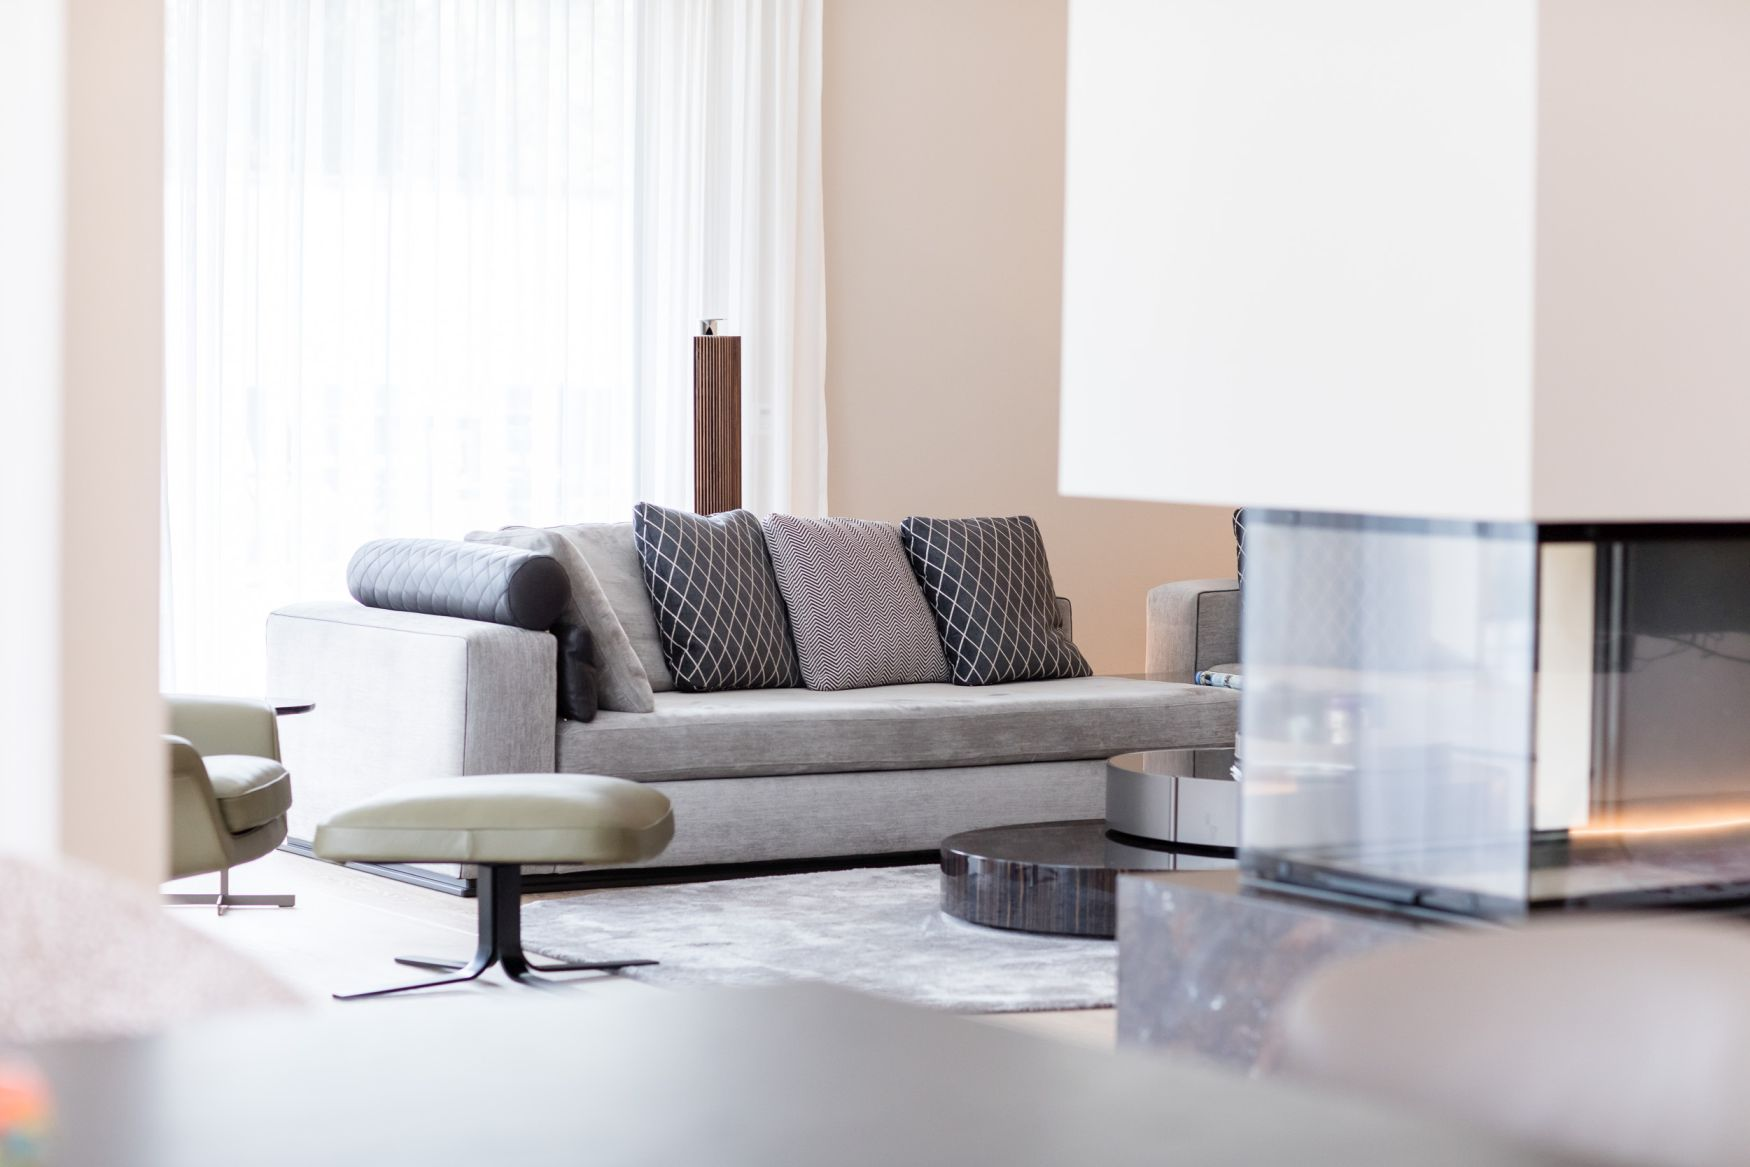 modern klassische villa m nchen joachim wagner interior design. Black Bedroom Furniture Sets. Home Design Ideas